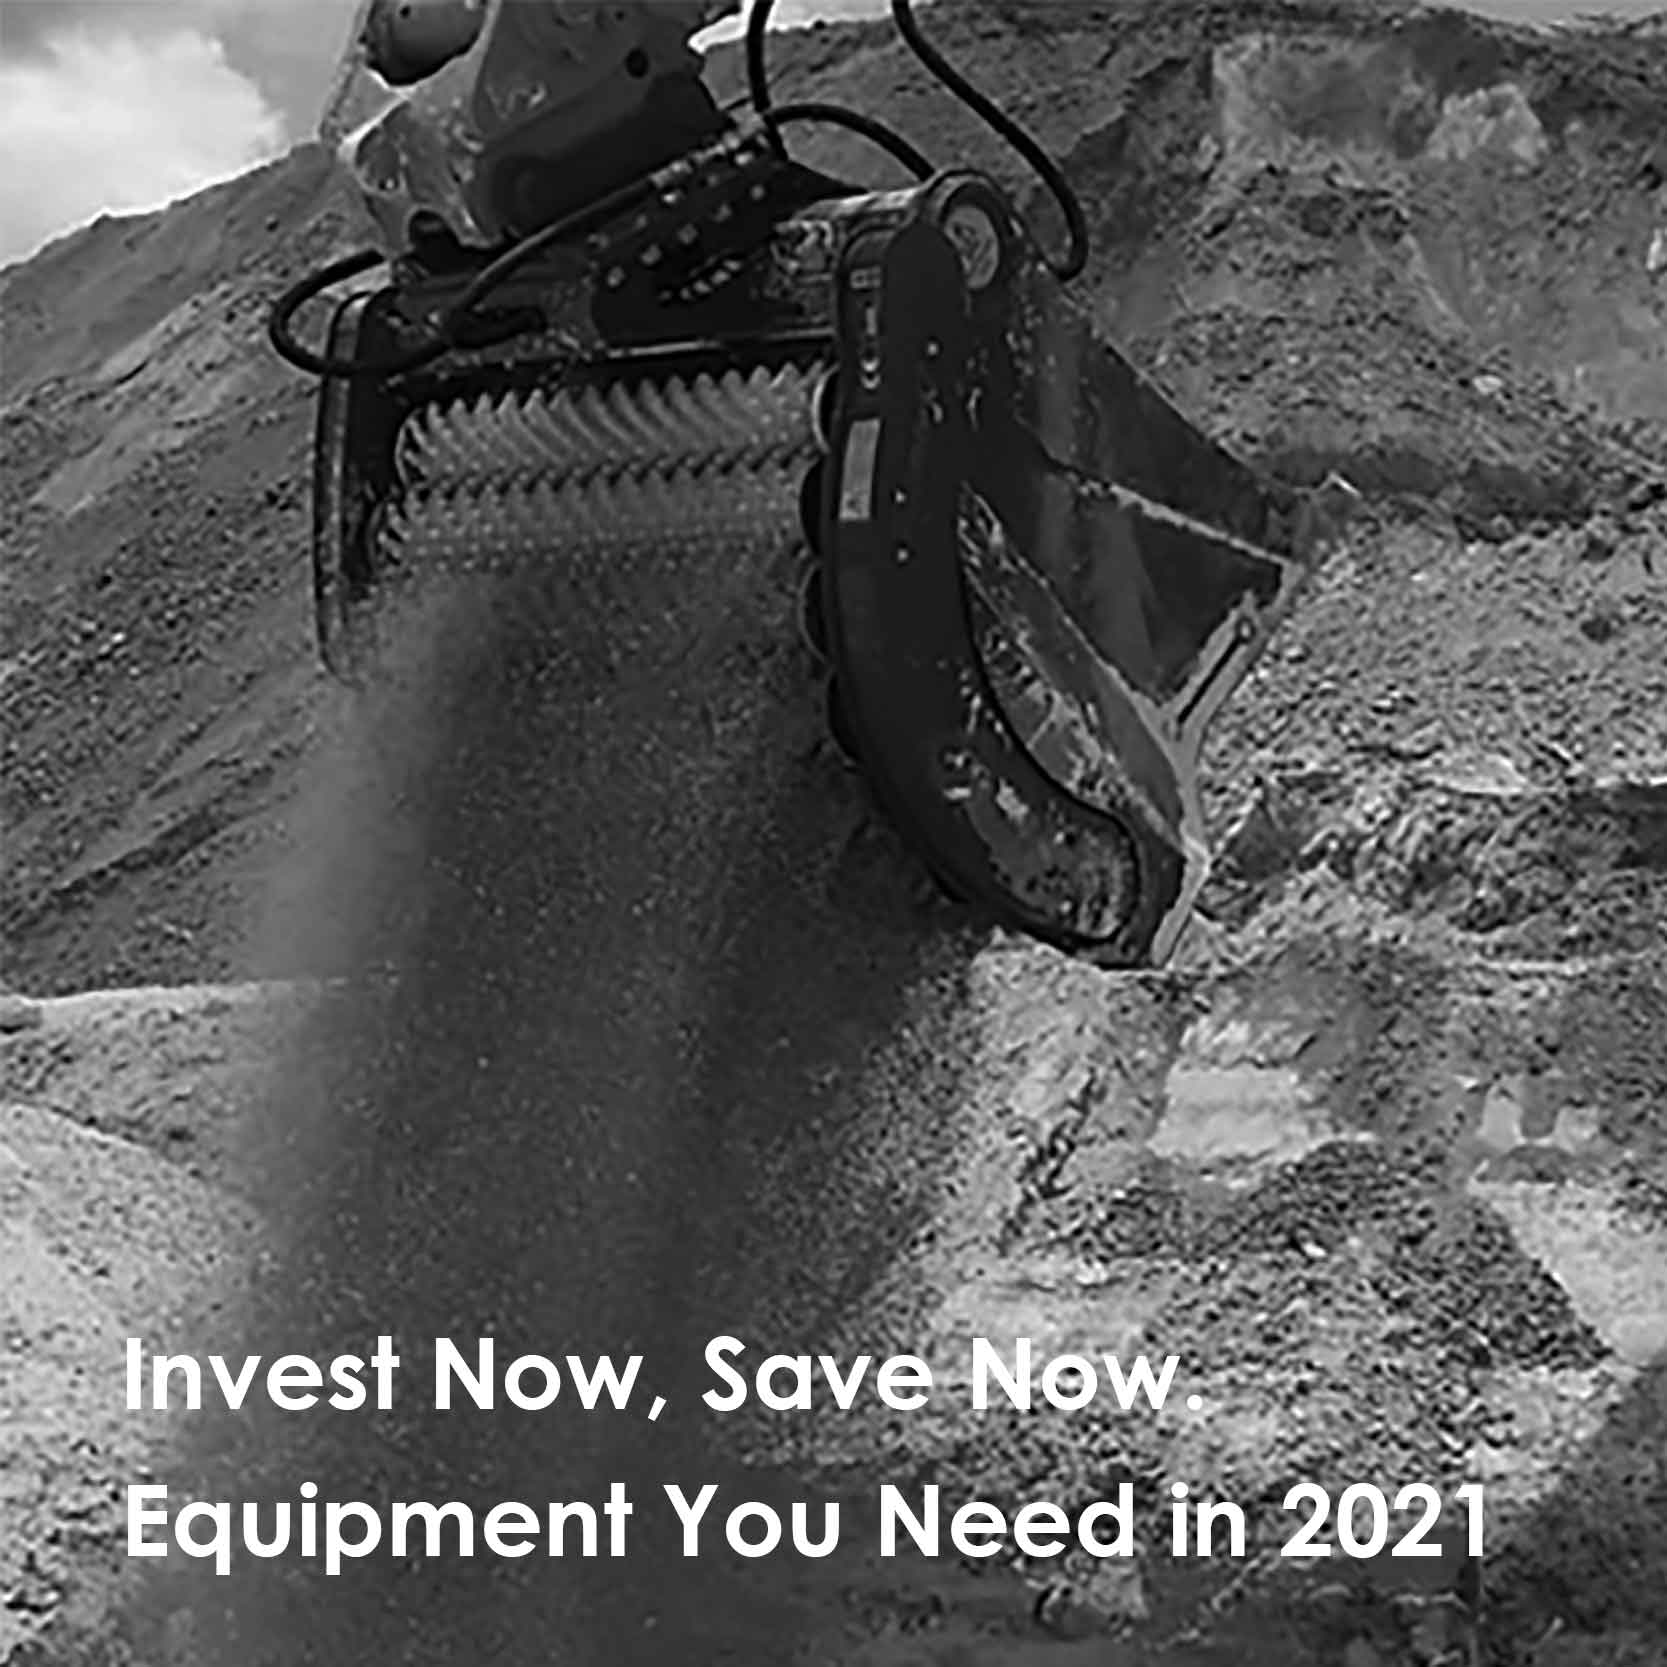 Section 179 Savings